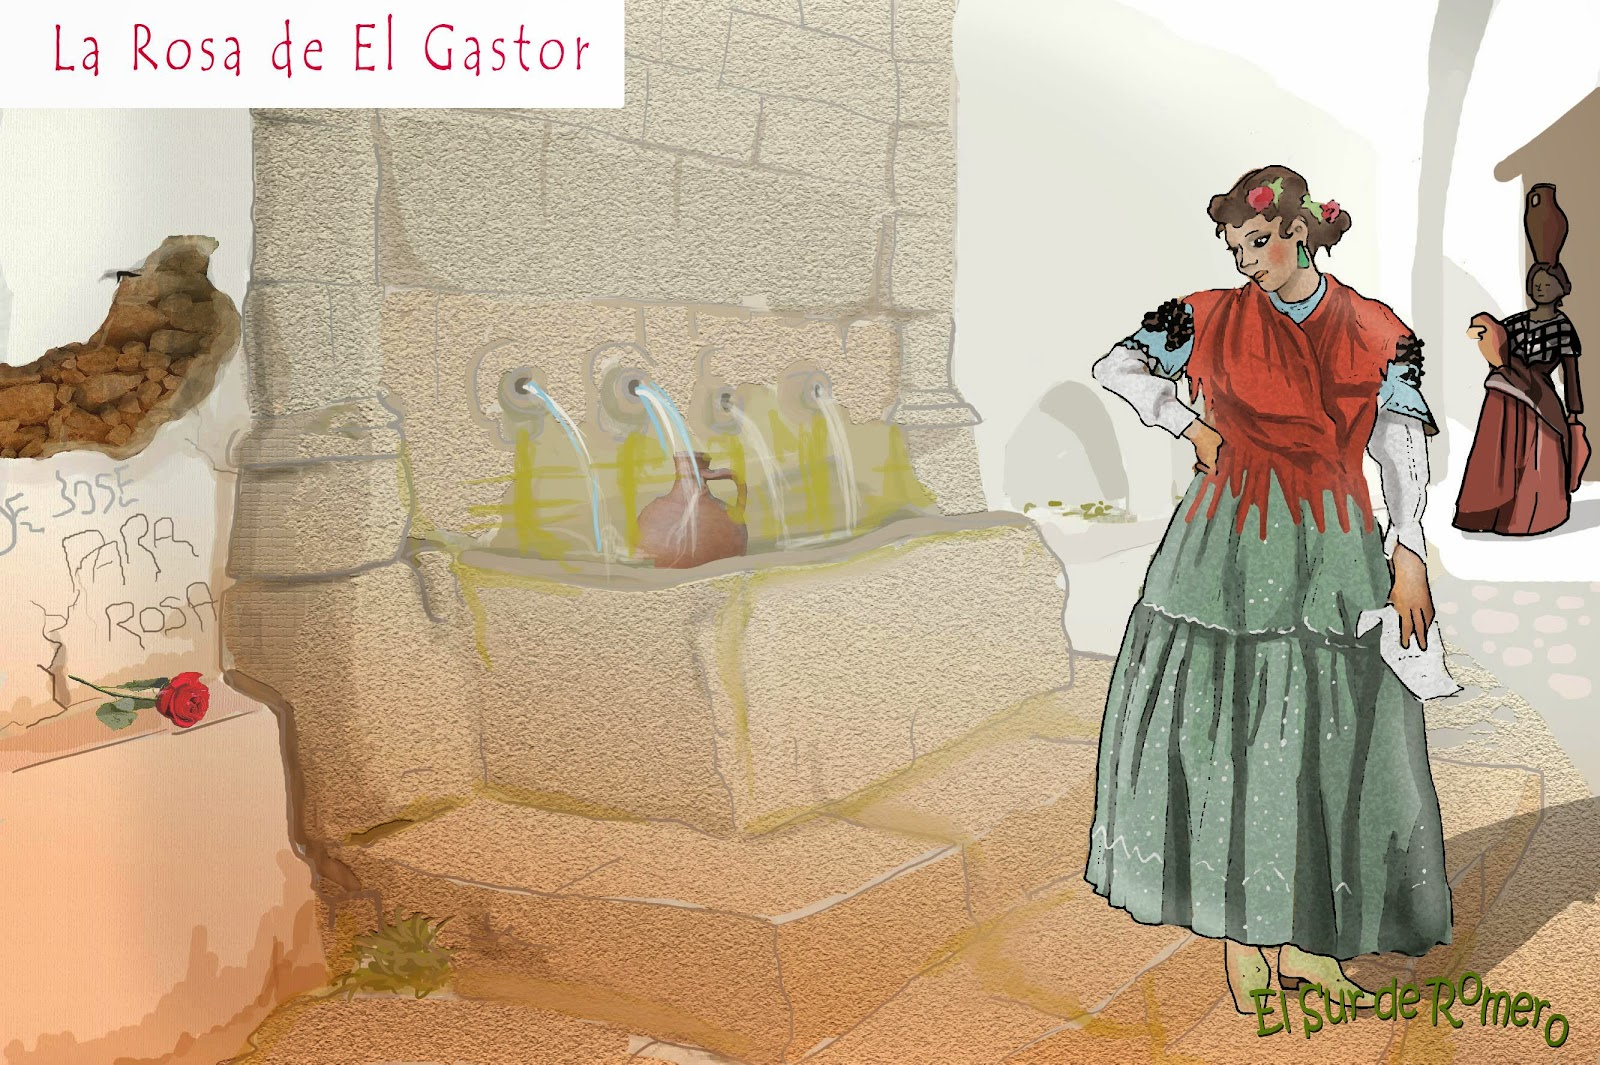 "<img src=""Rosa de El Gastor.jpg"" alt=""Mujeres de la Sierra de Cádiz""/>"